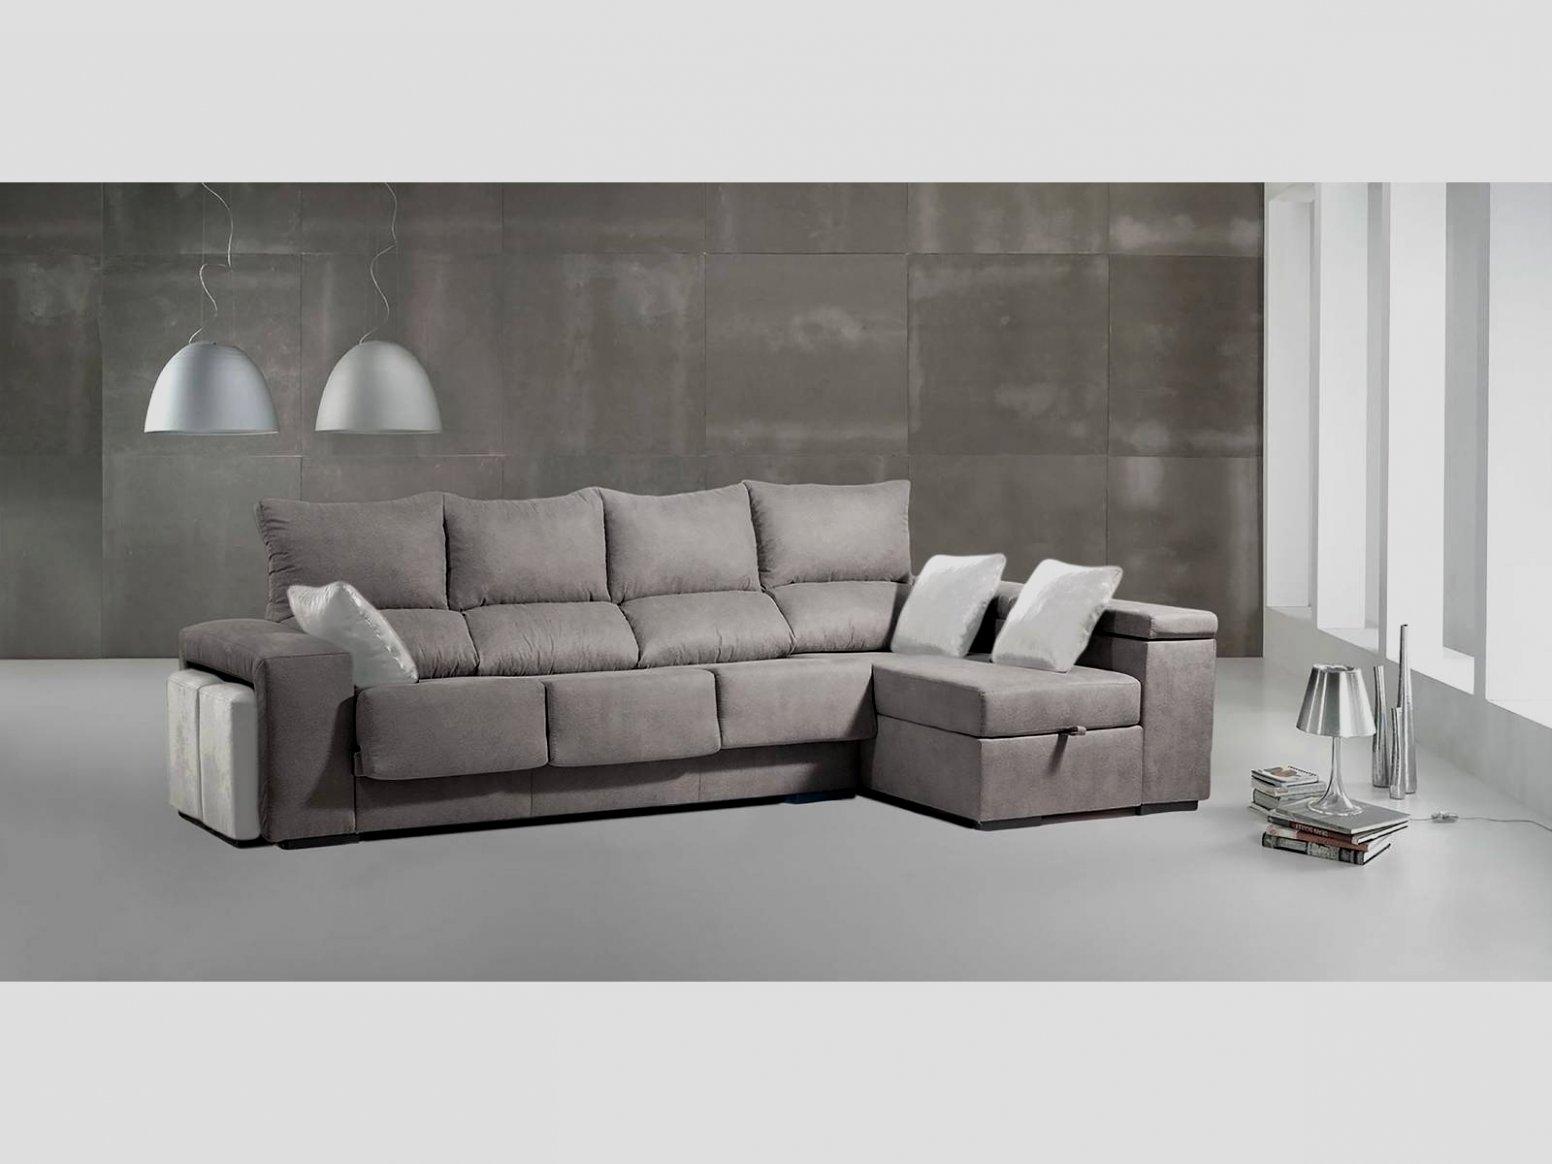 Sofas Cheslong Conforama Q0d4 sofas Cheslong Conforama Especial Conforama sofas Unique Conforama